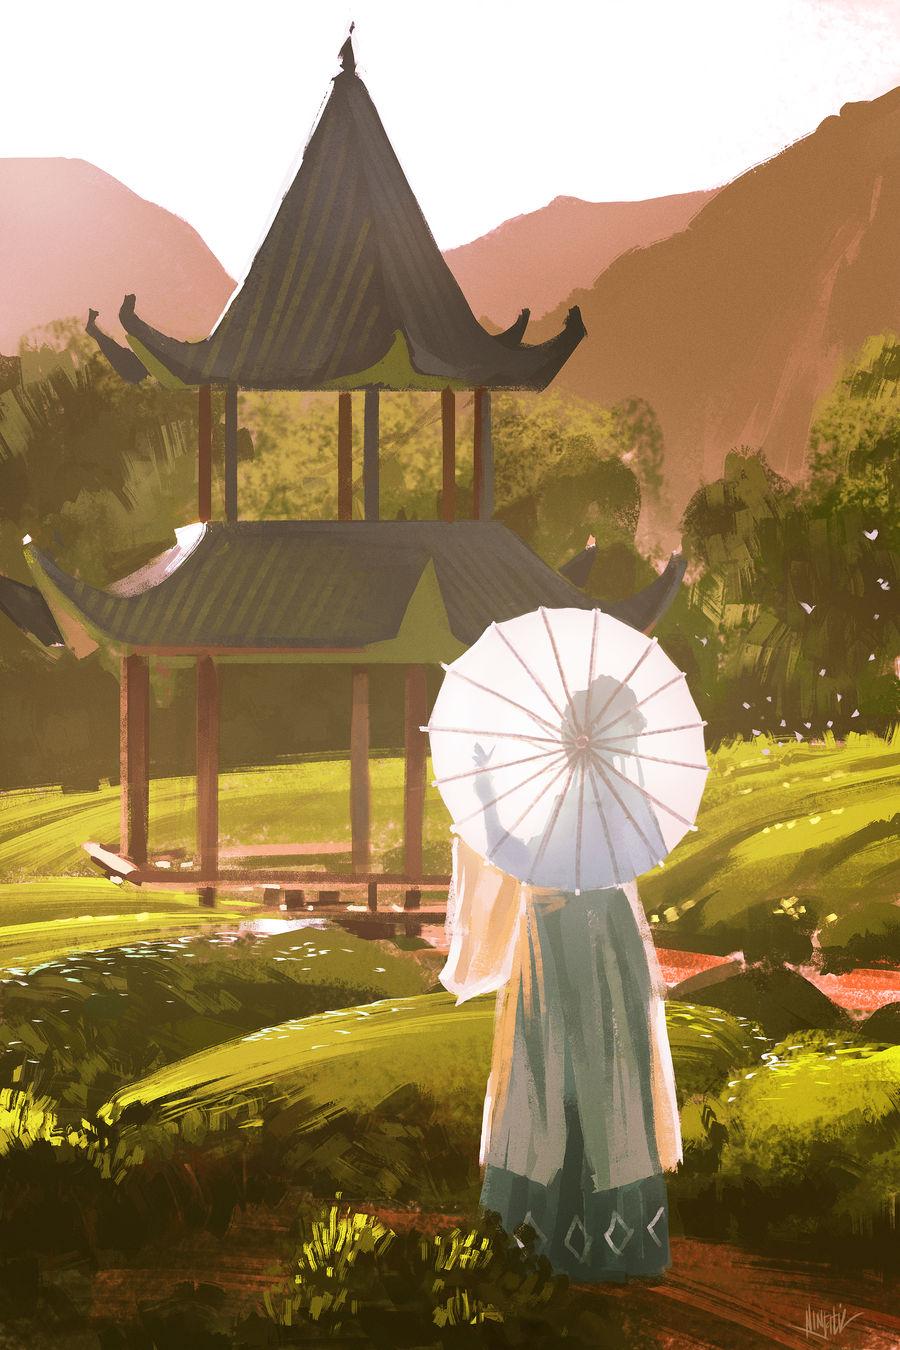 Garden Stroll by Ninjatic